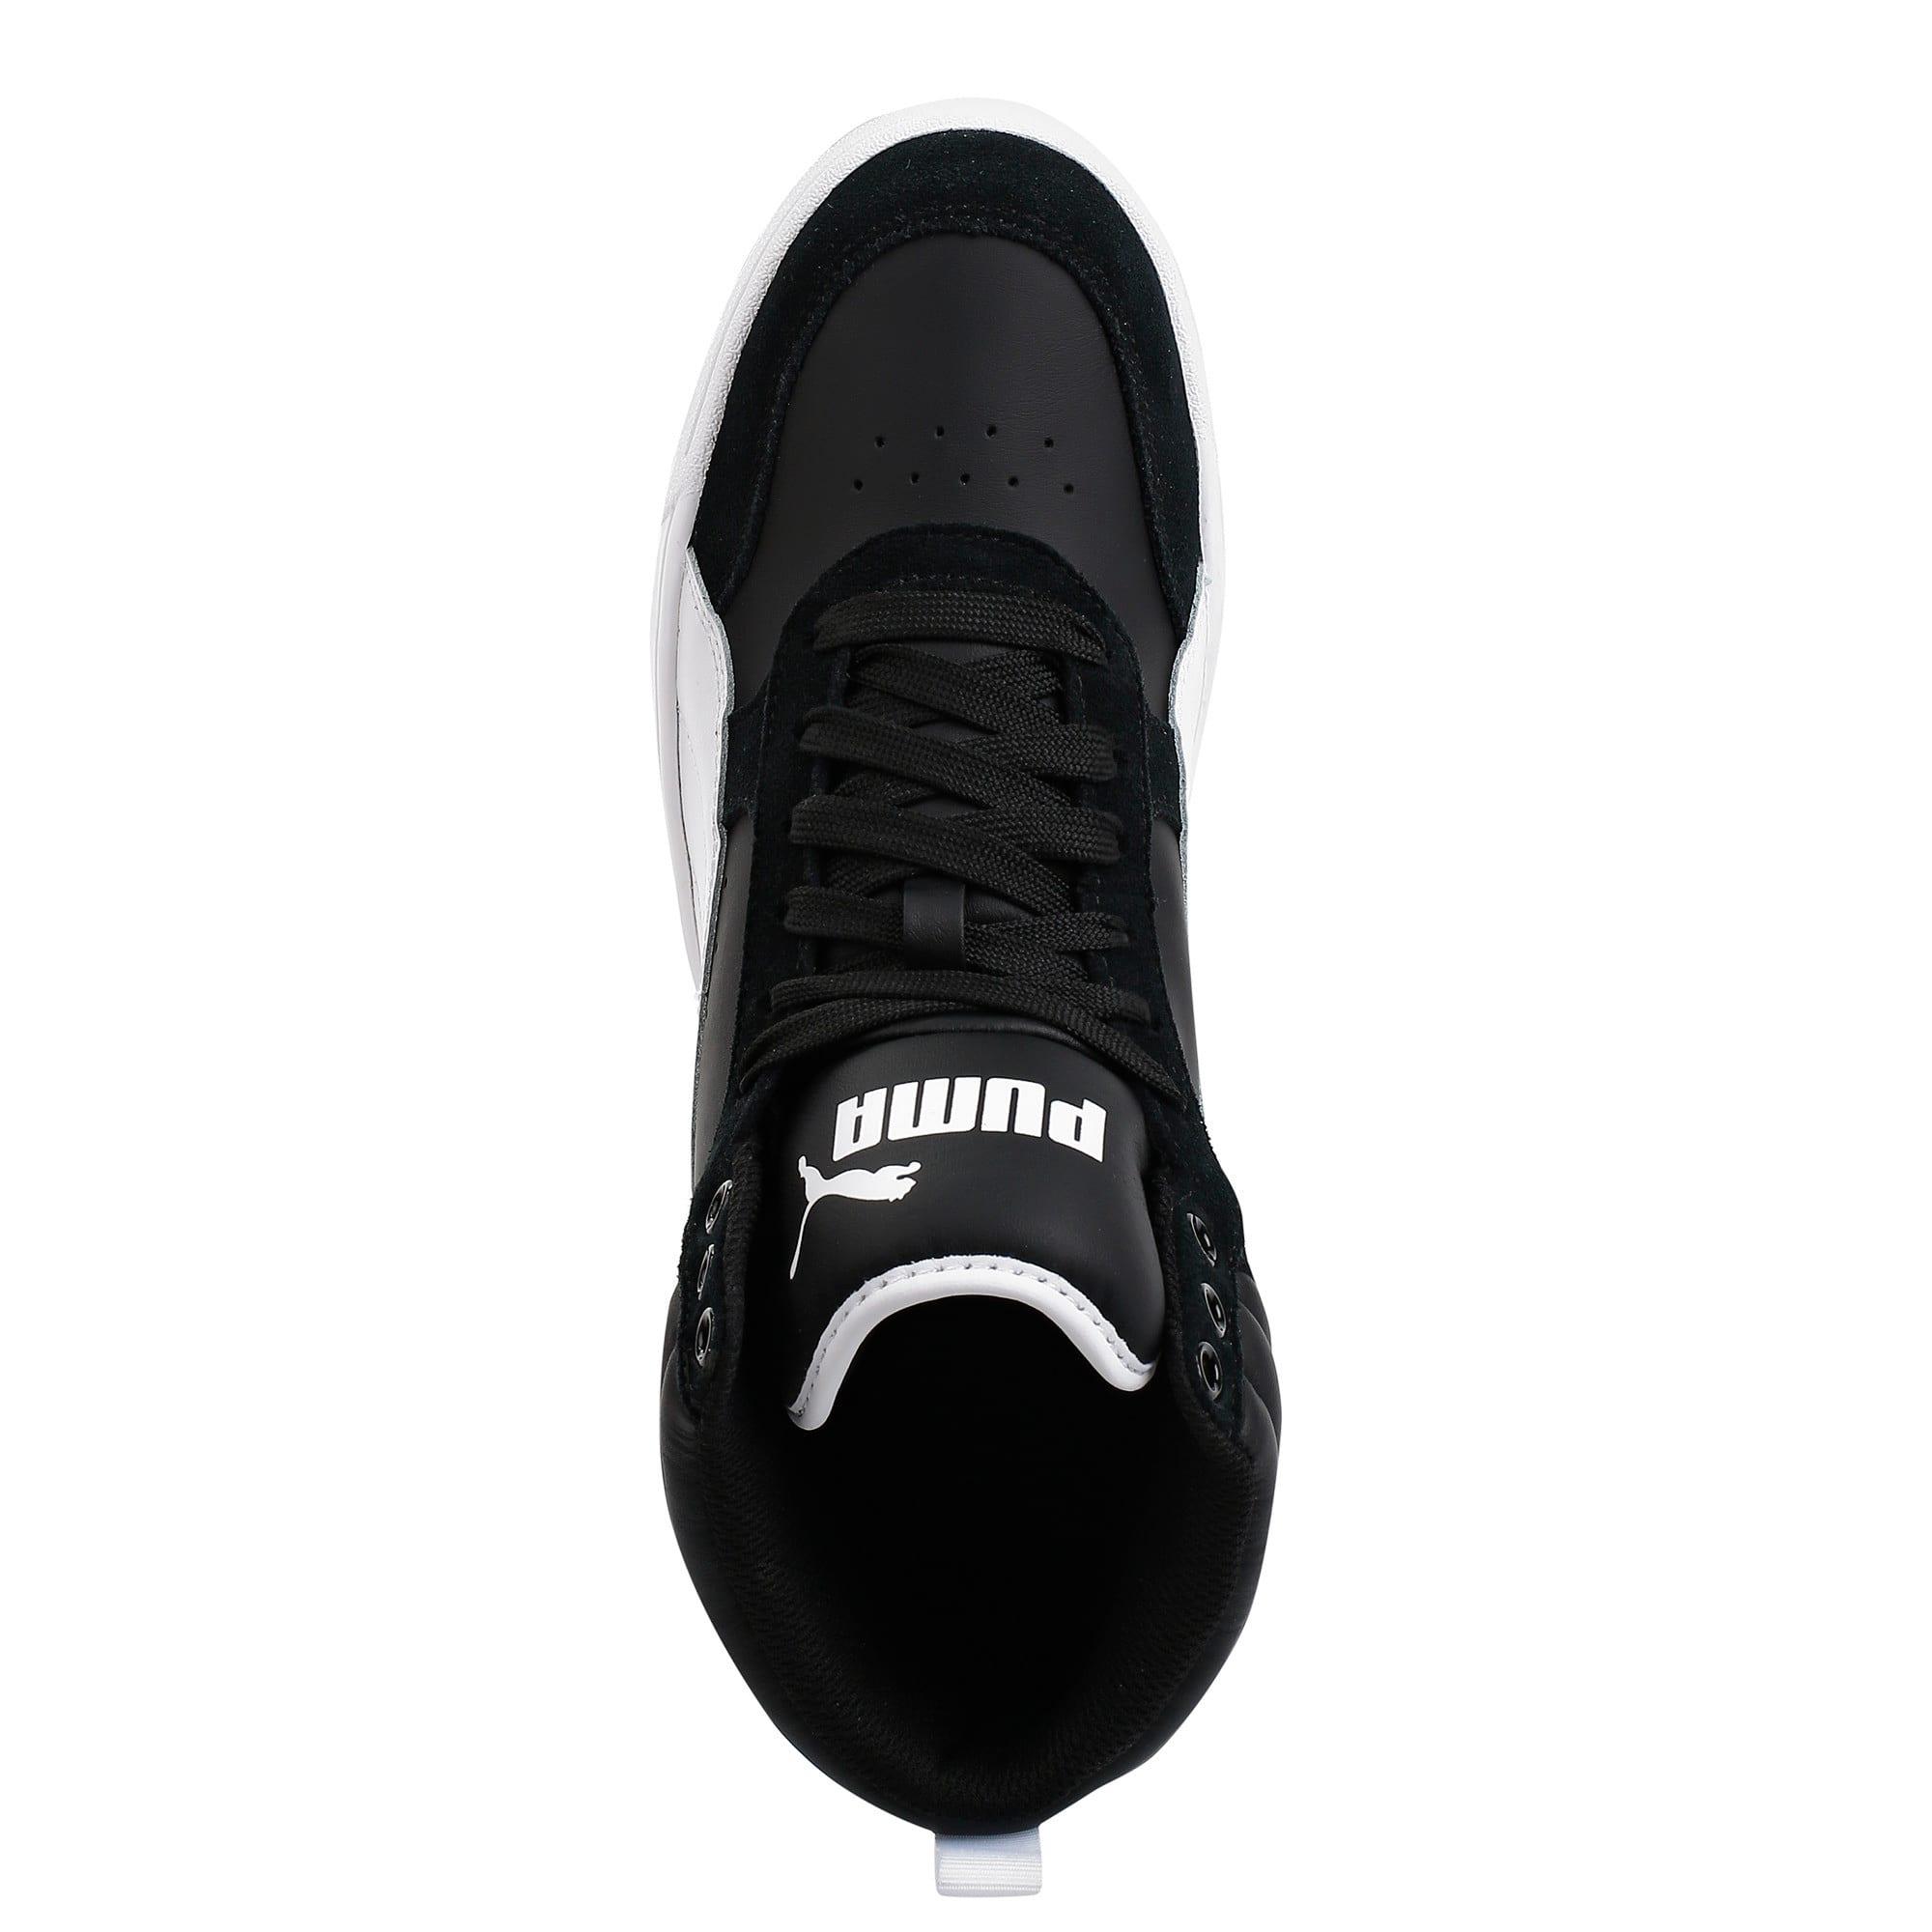 Thumbnail 5 of Puma Rebound Street v2 Sneakers, Puma Black-Puma White, medium